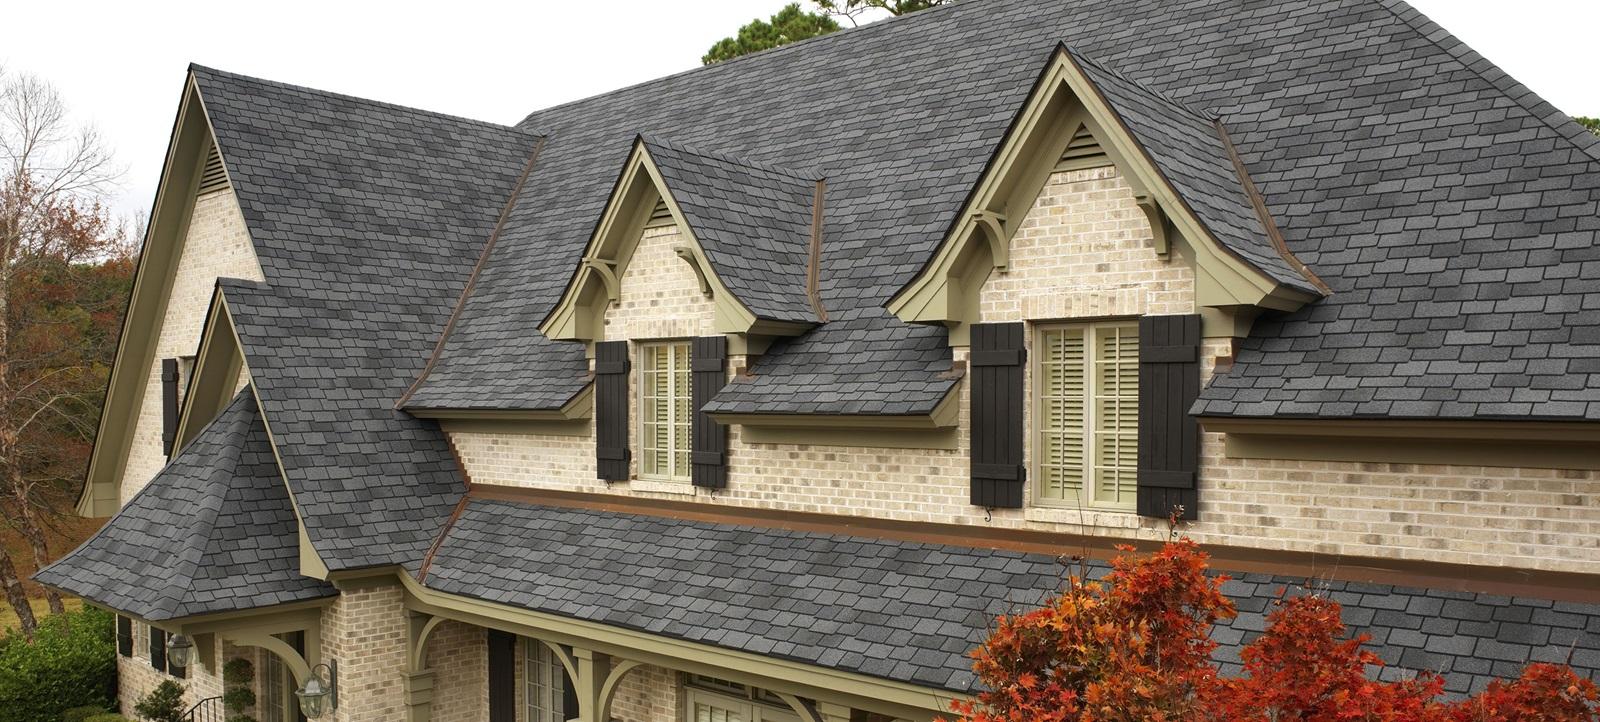 Woodland Roof Shingle Lifetime Designer Roofing Shingles